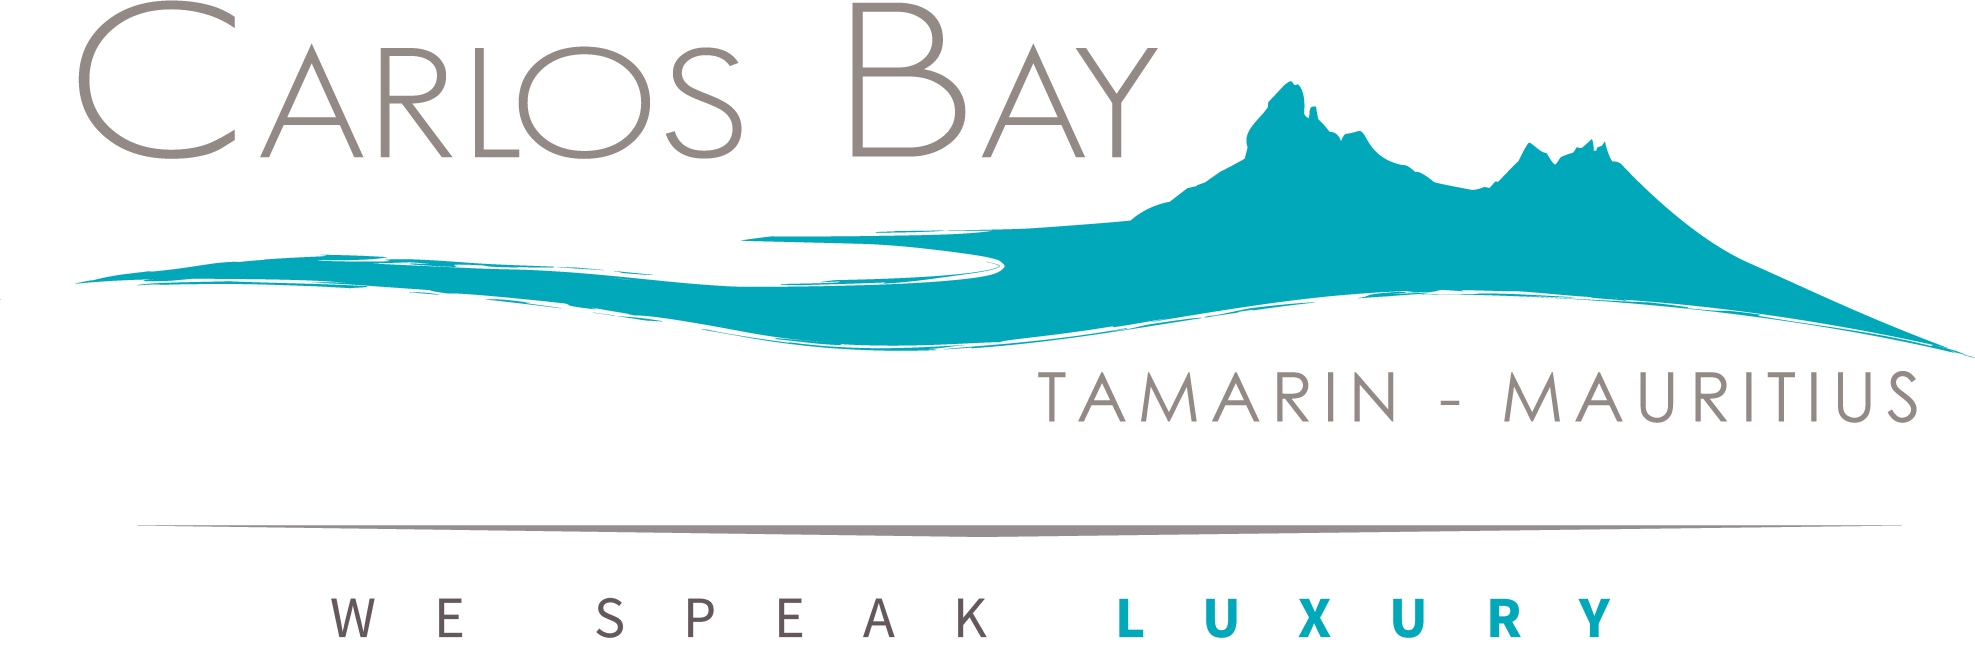 Carlos Bay logo